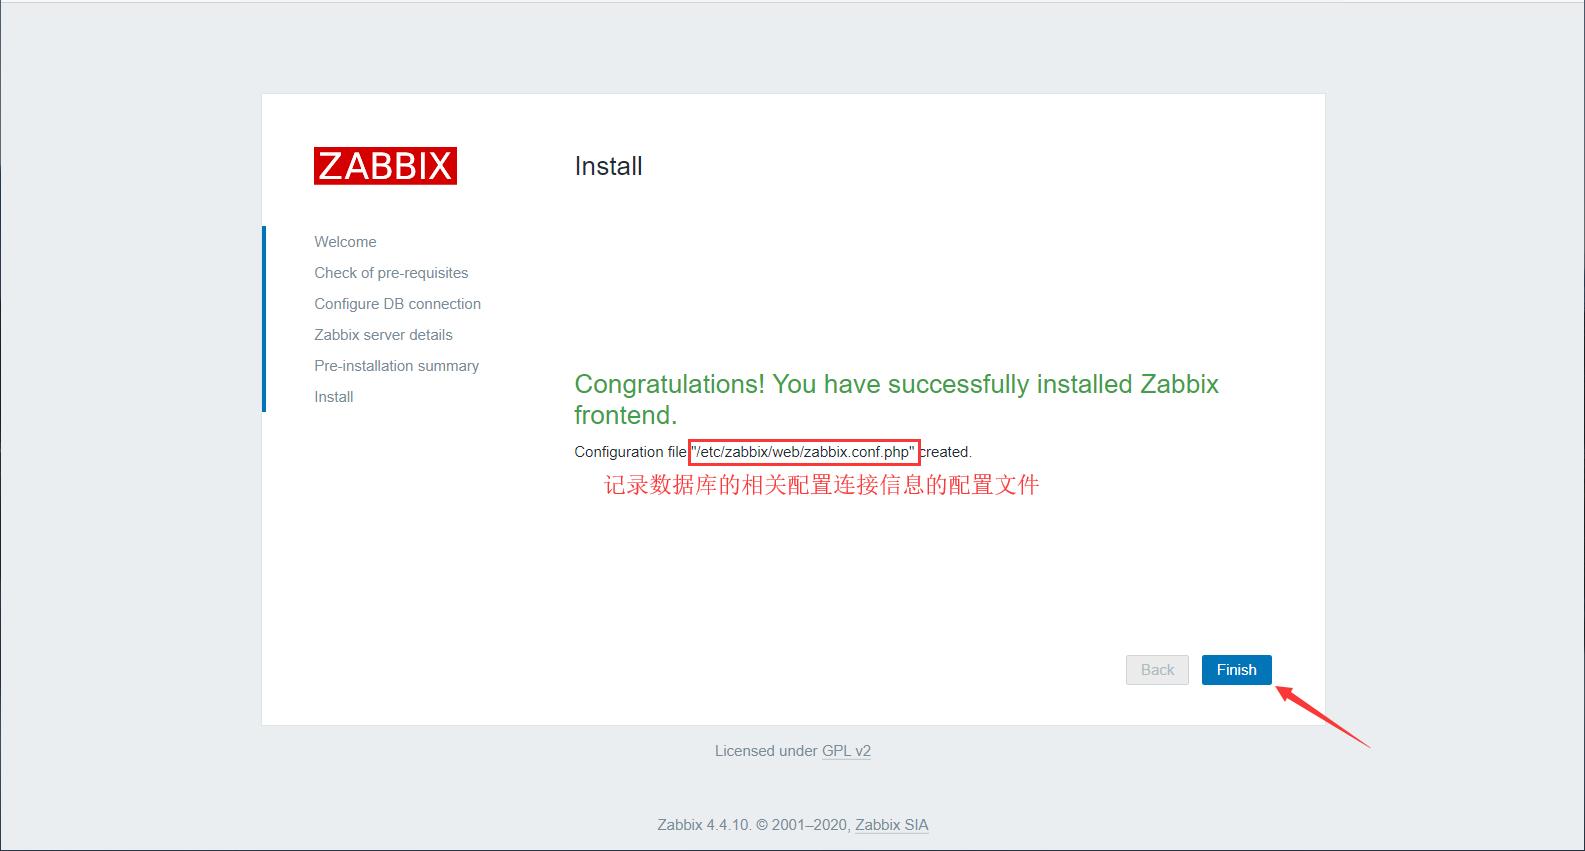 zabbix_install-6.png